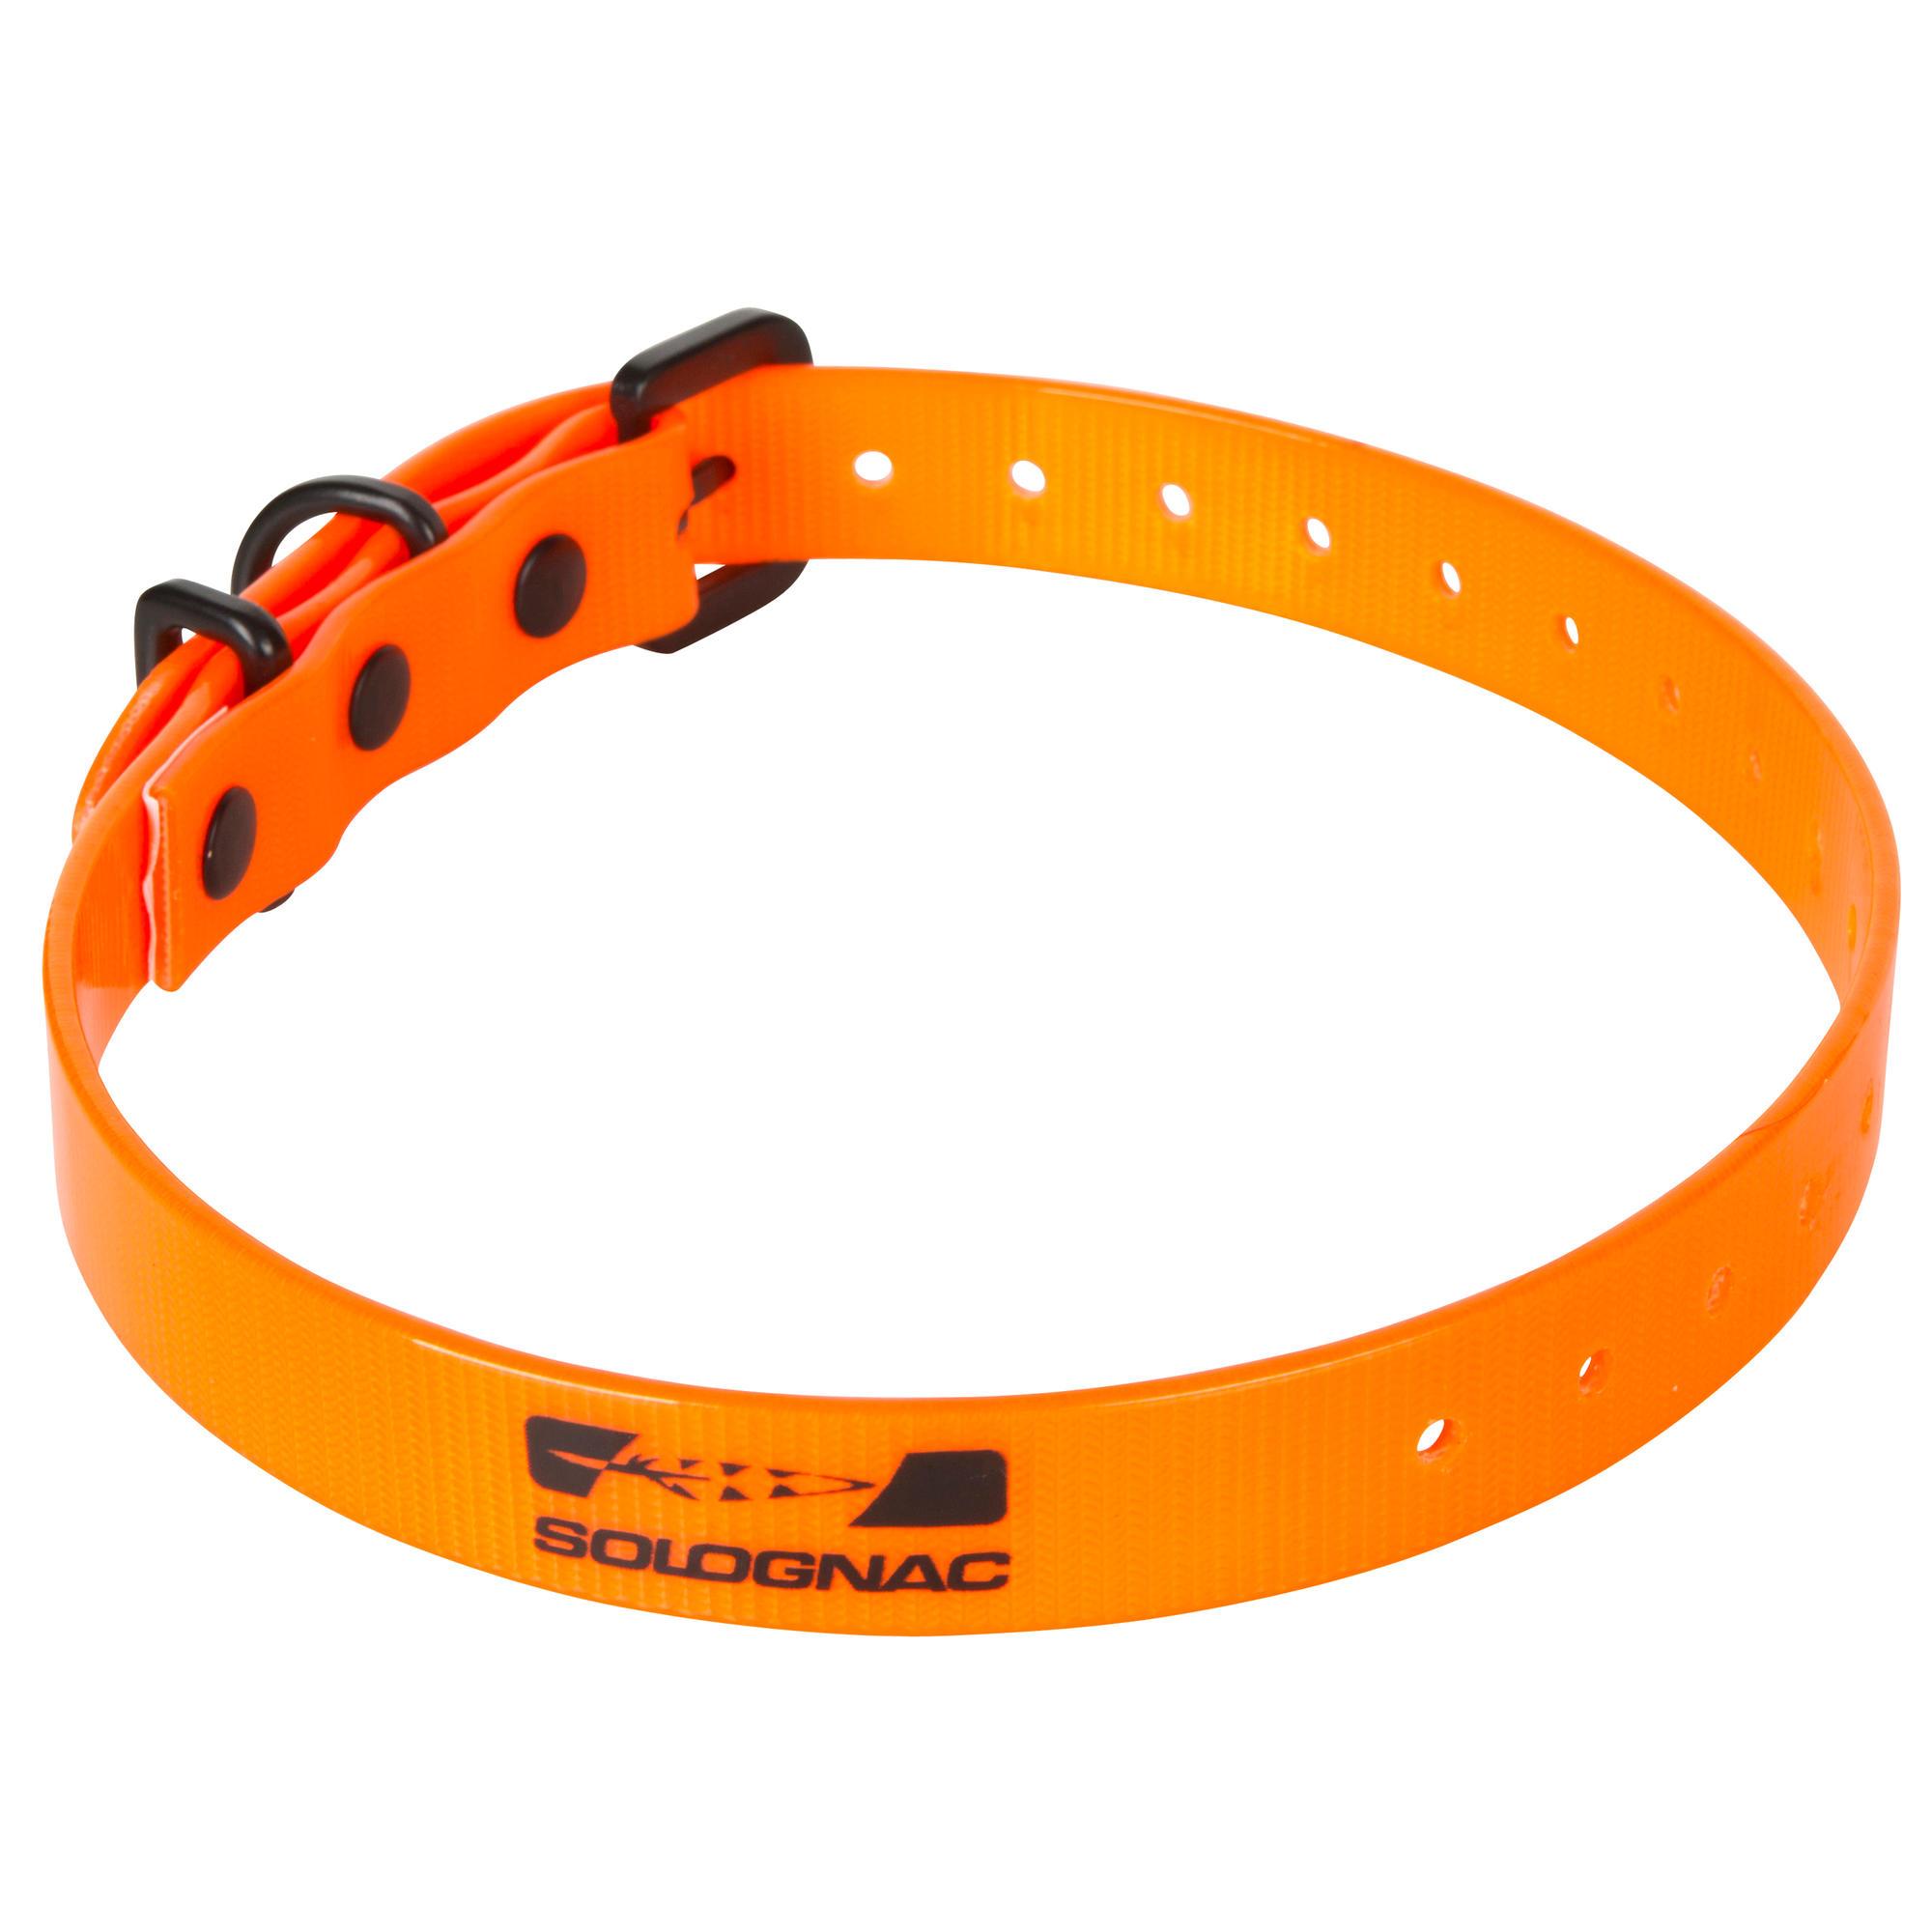 collier chien 300 orange solognac. Black Bedroom Furniture Sets. Home Design Ideas